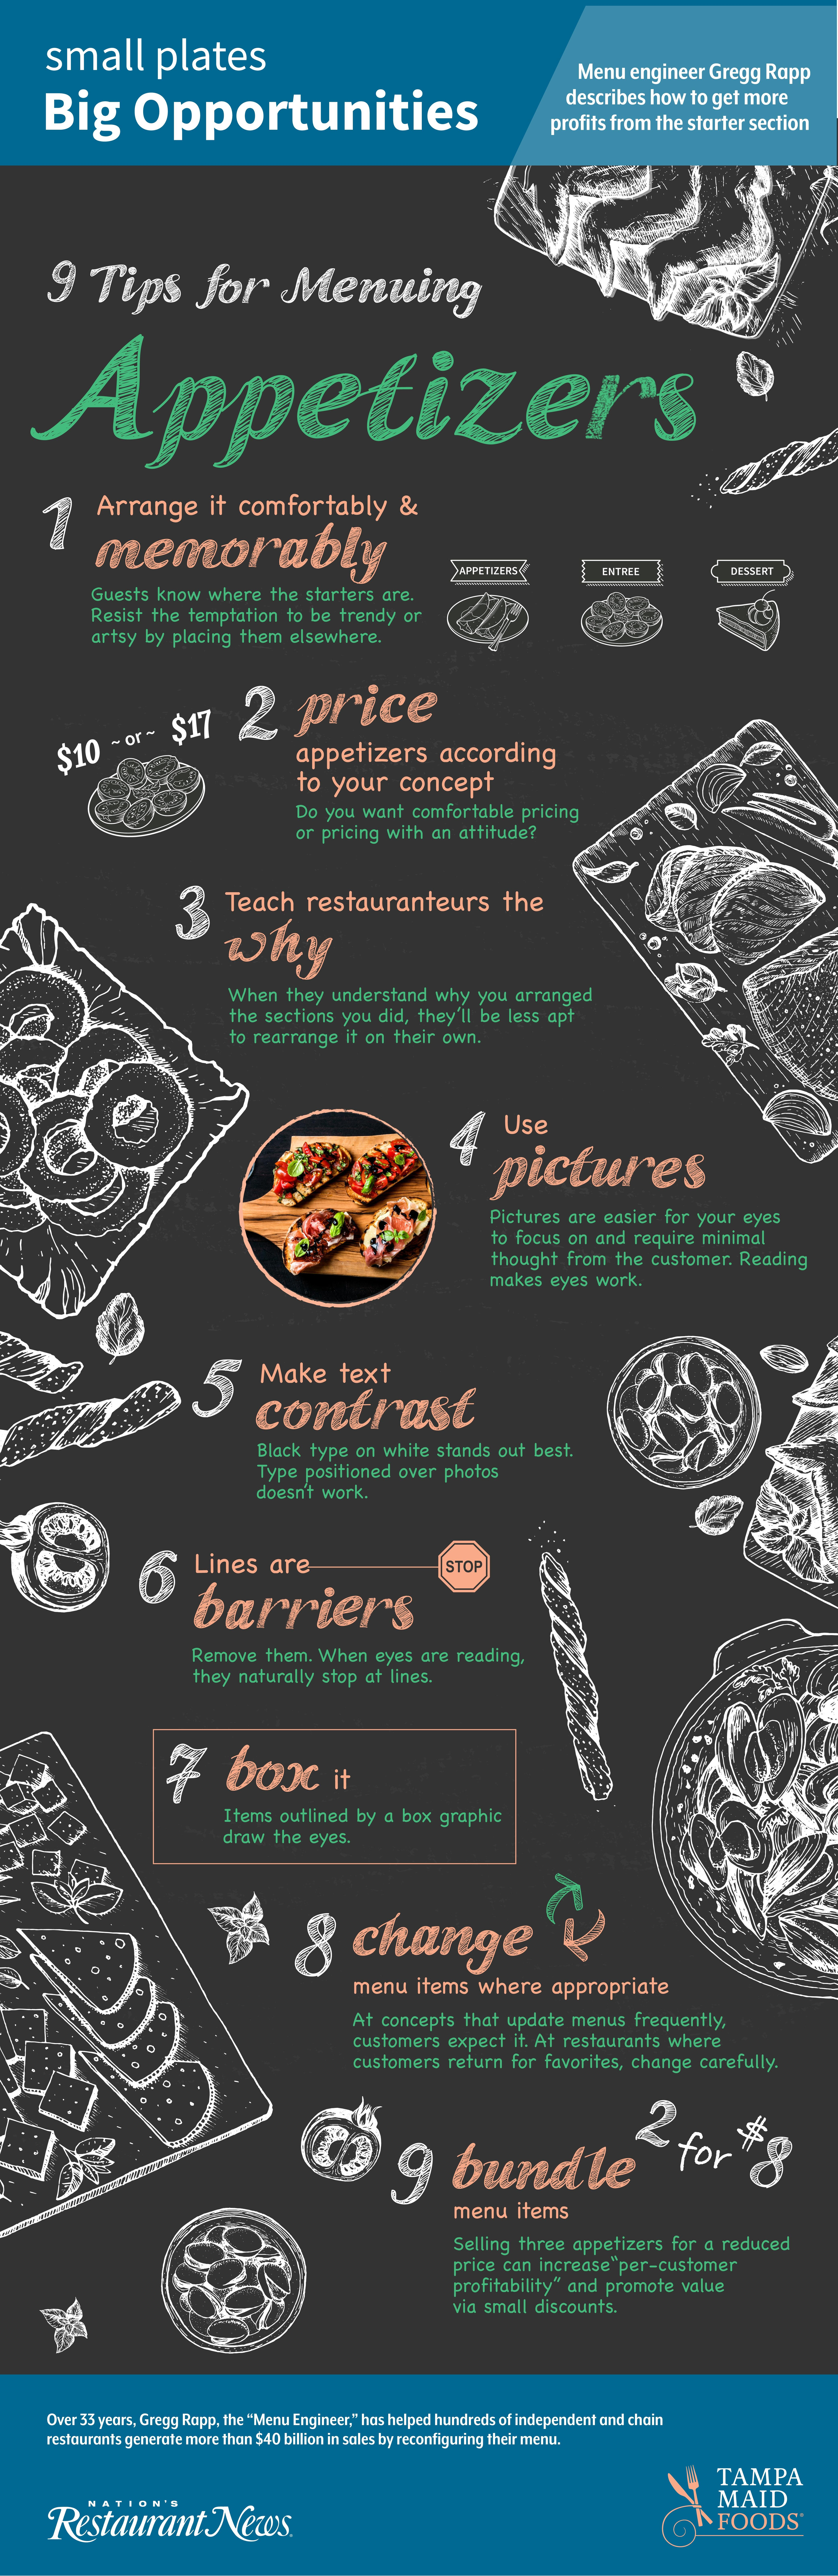 TampaMaid_Infographic